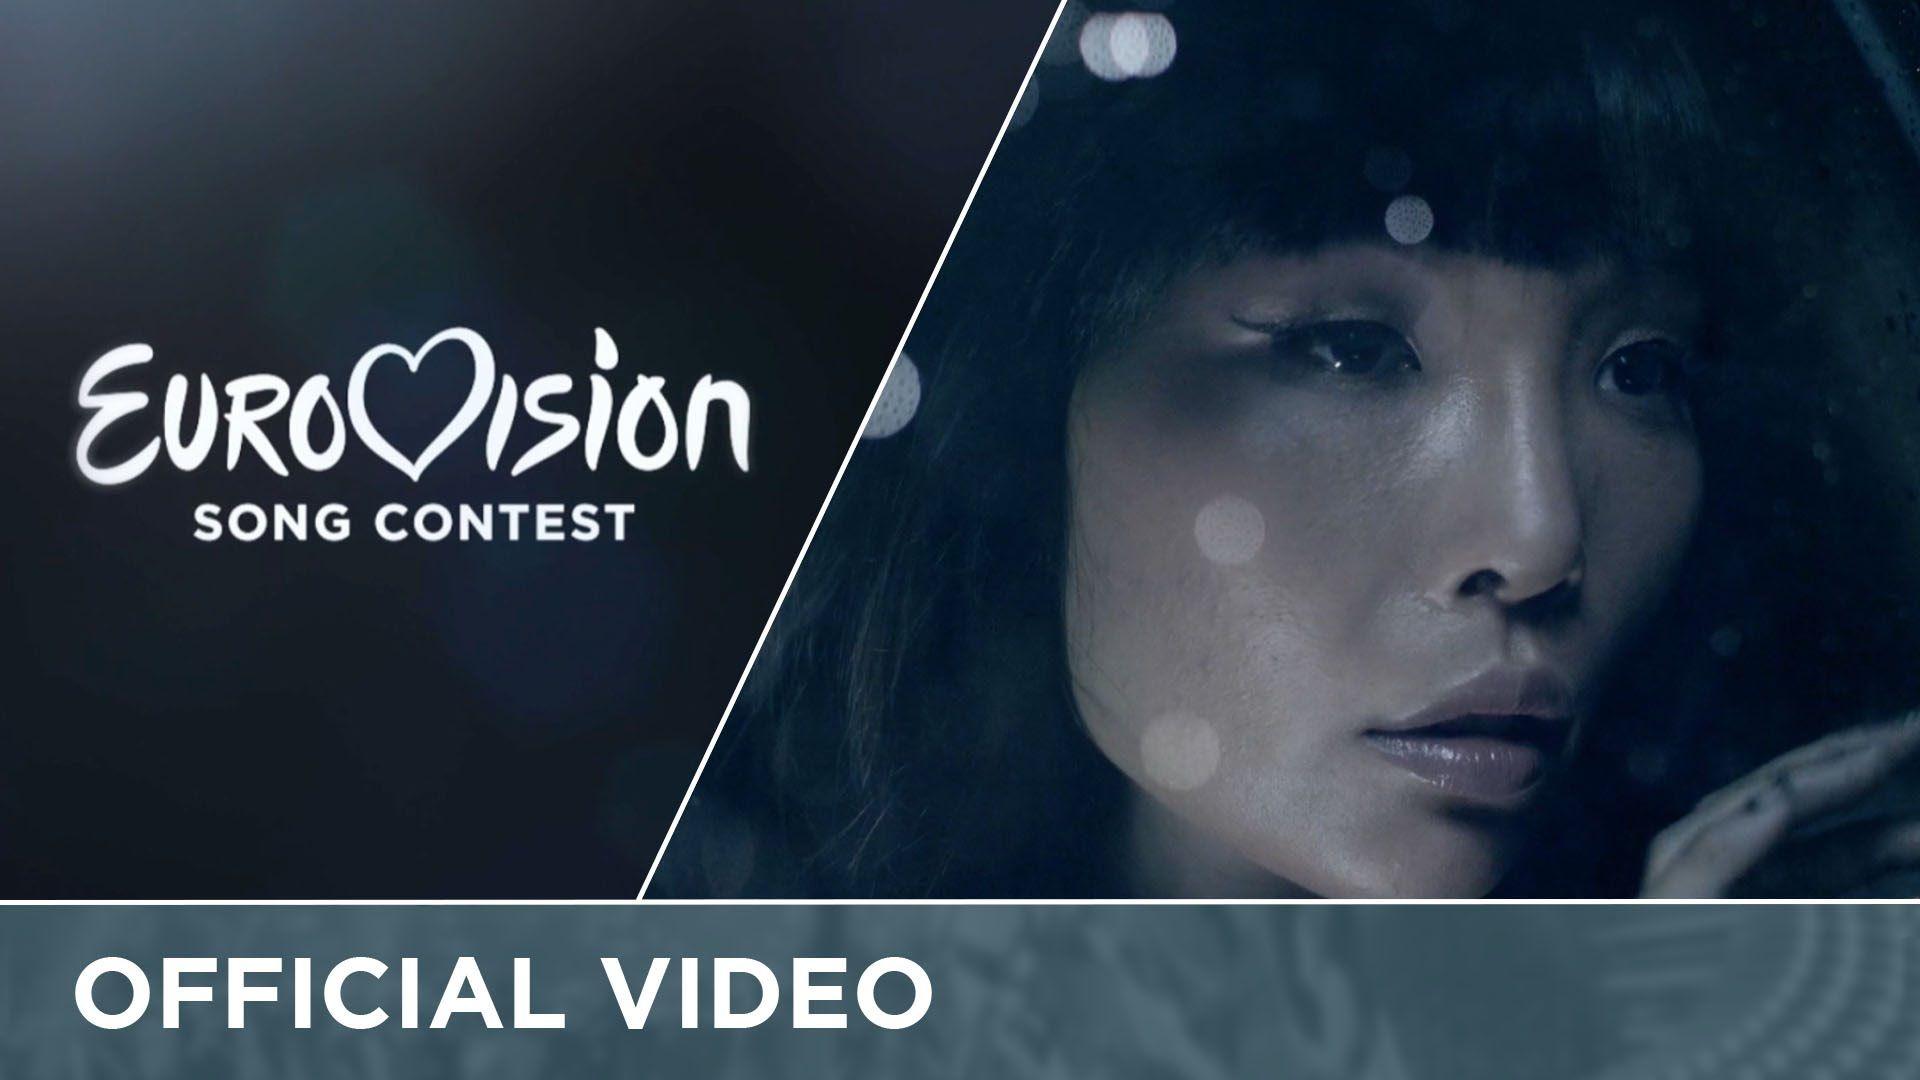 Dami Im - Sound Of Silence (Australia) 2016 Eurovision Song